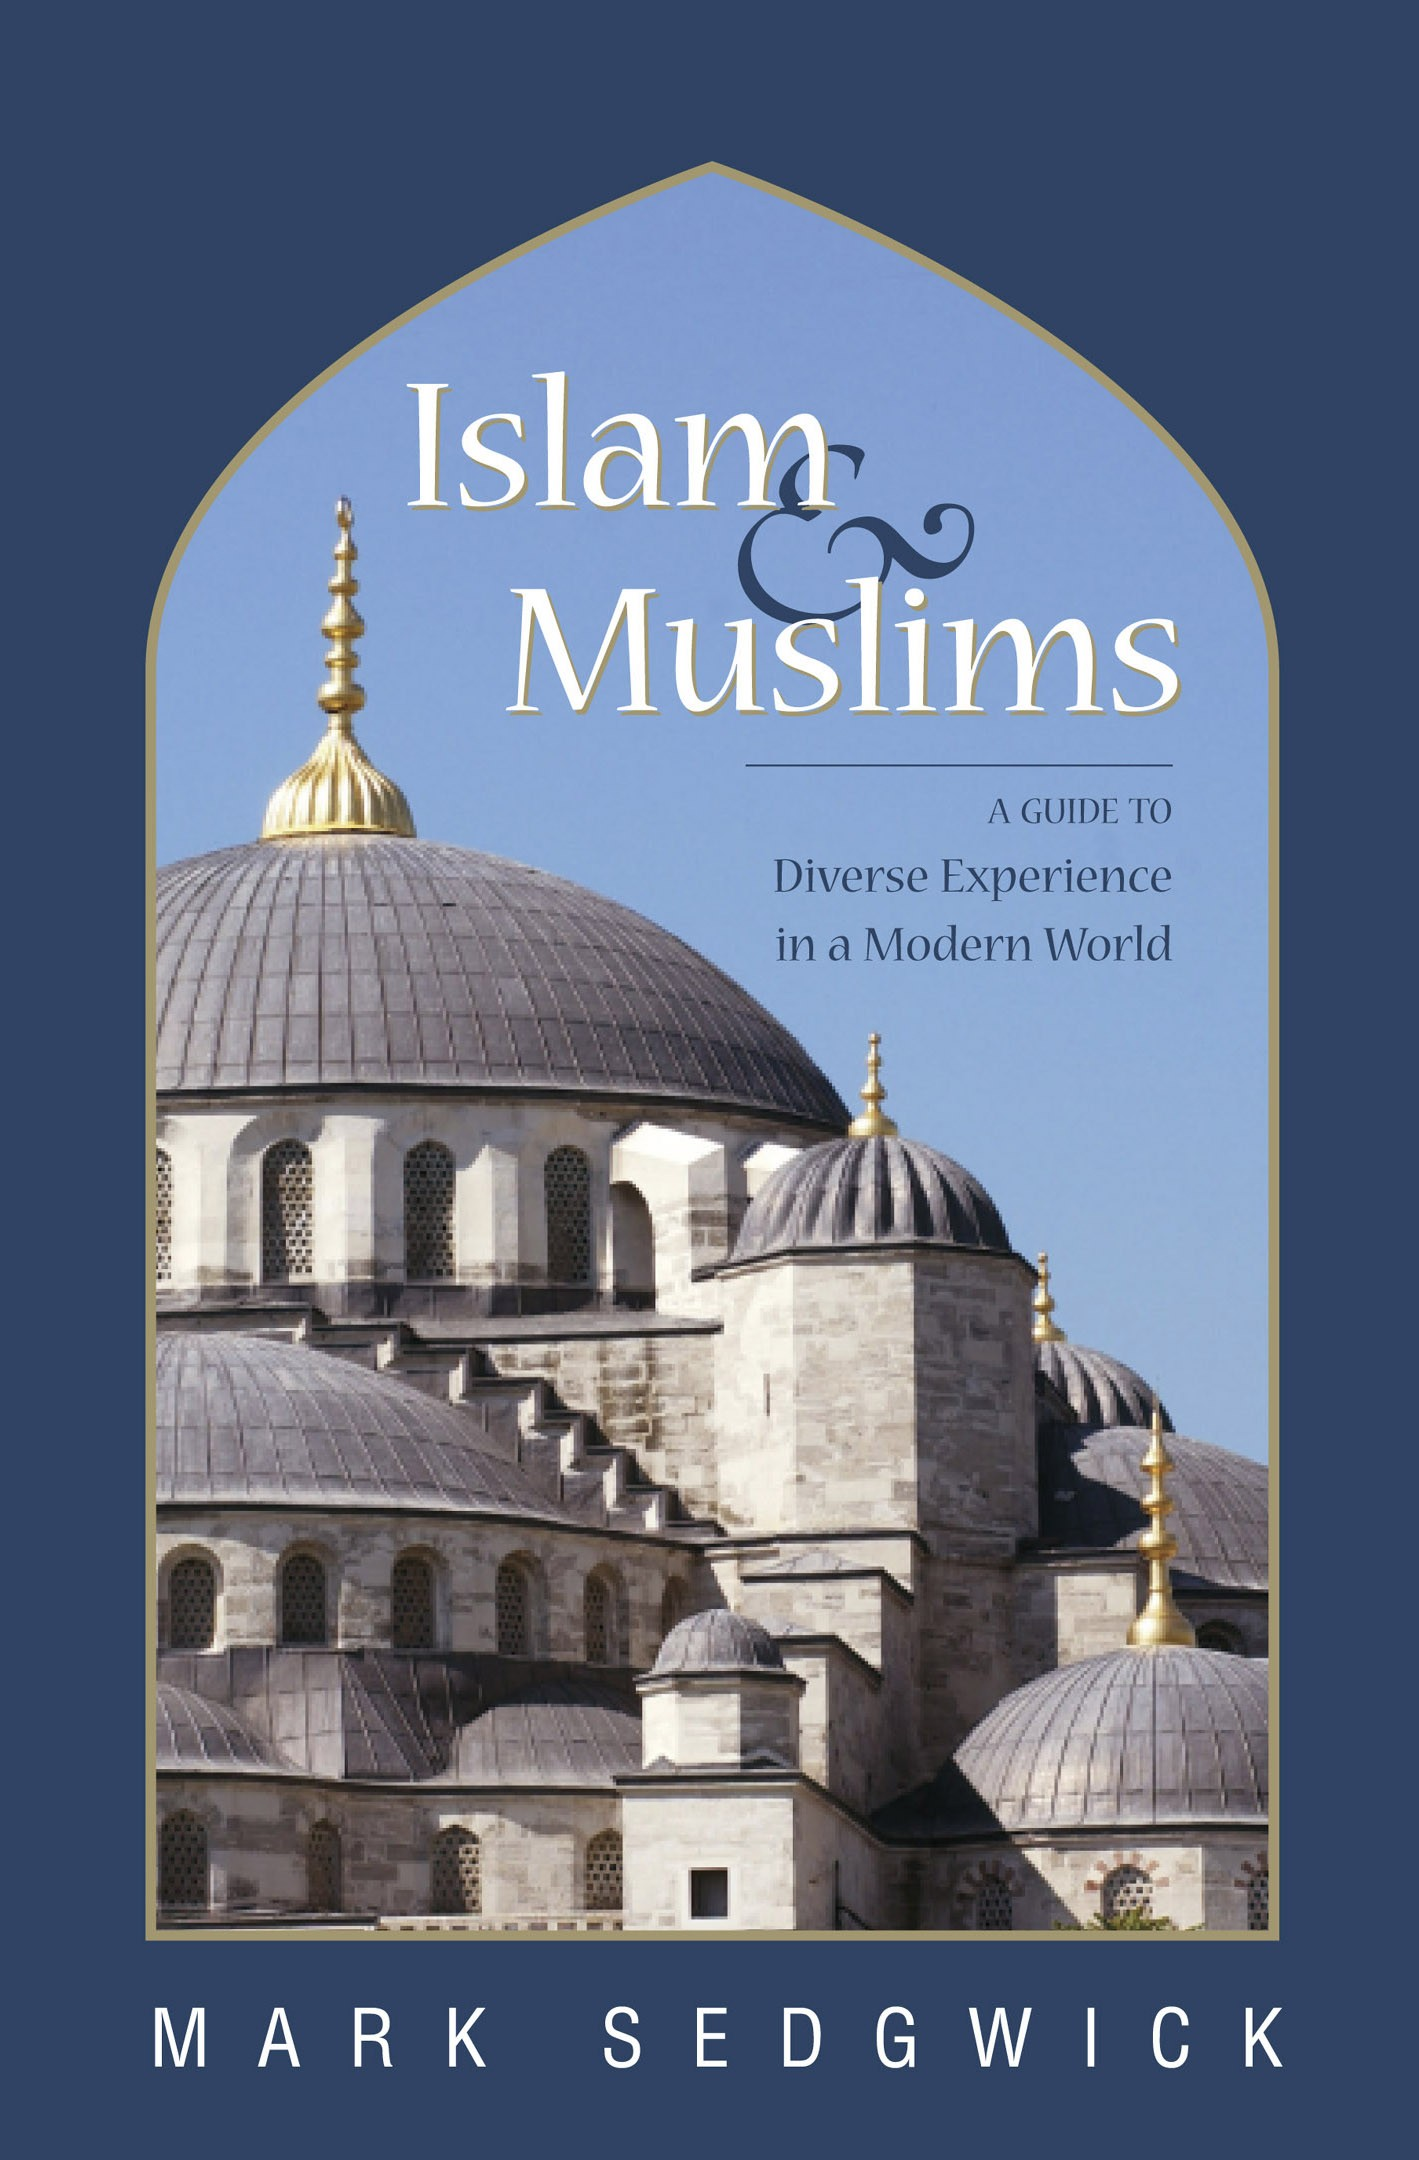 Islam&Muslim hi-res.jpg